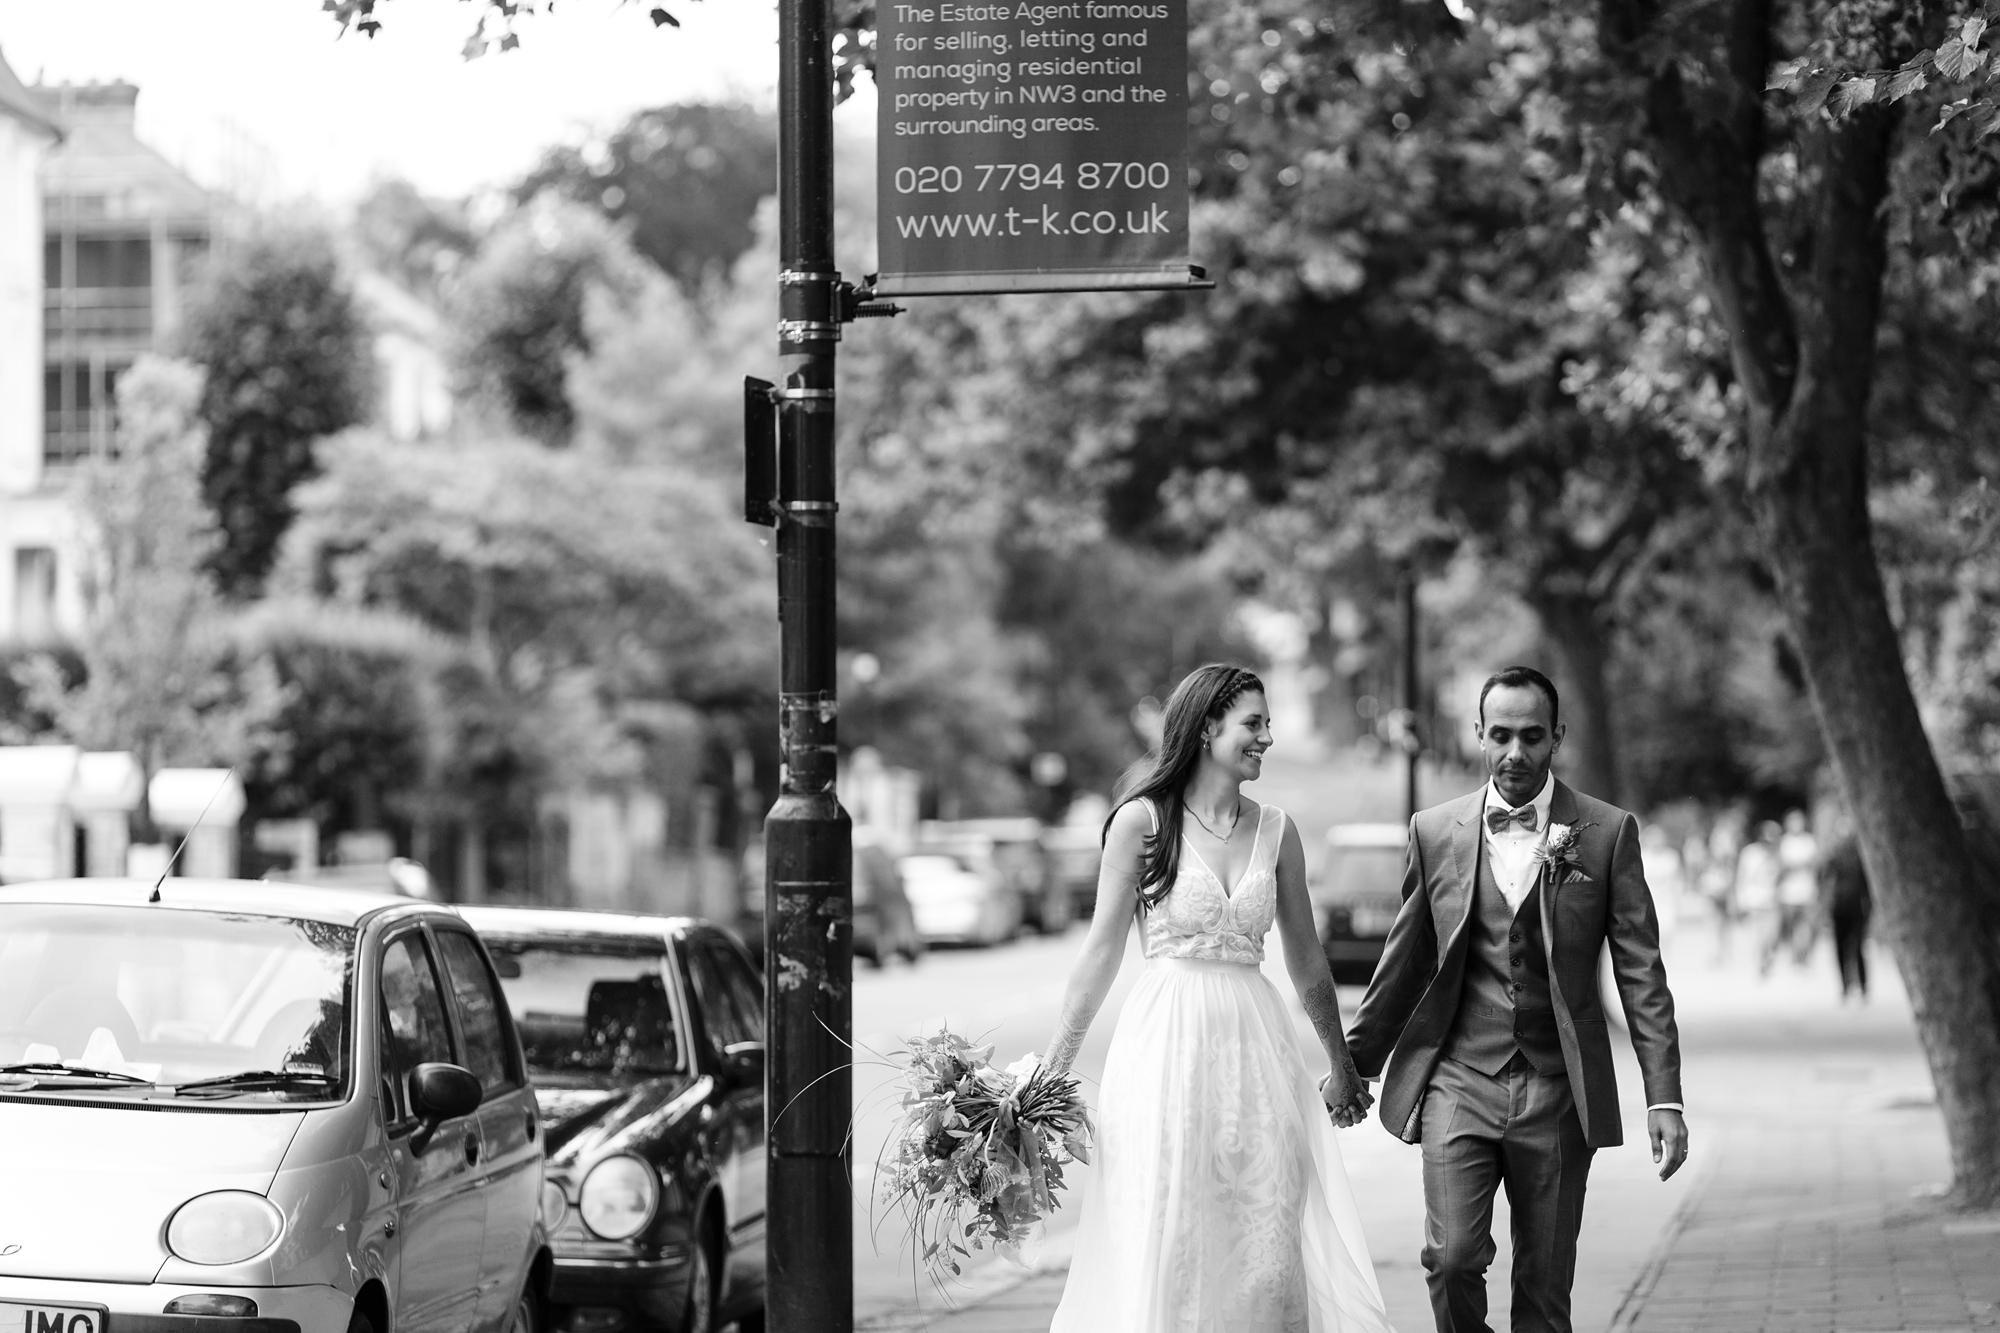 St. Stephens Hampstead Wedding bride and groom walk up the street in Hamstead